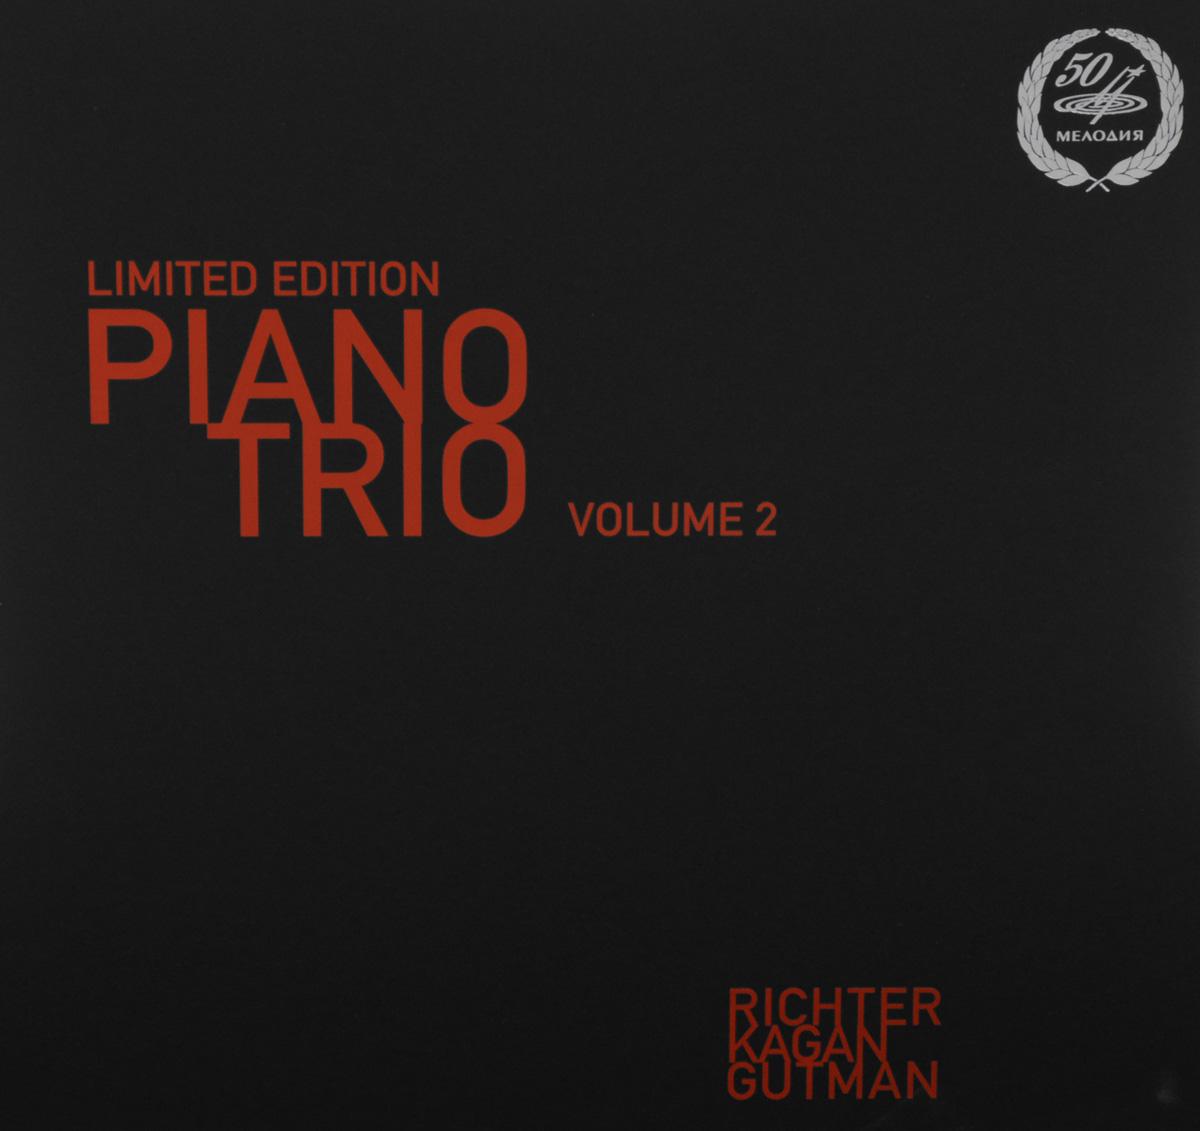 Святослав Рихтер,Олег Каган,Наталья Гутман Richter / Kagan / Gutman. Piano Trio. Volume 2. Limited Edition (LP) richter 12224255111 28